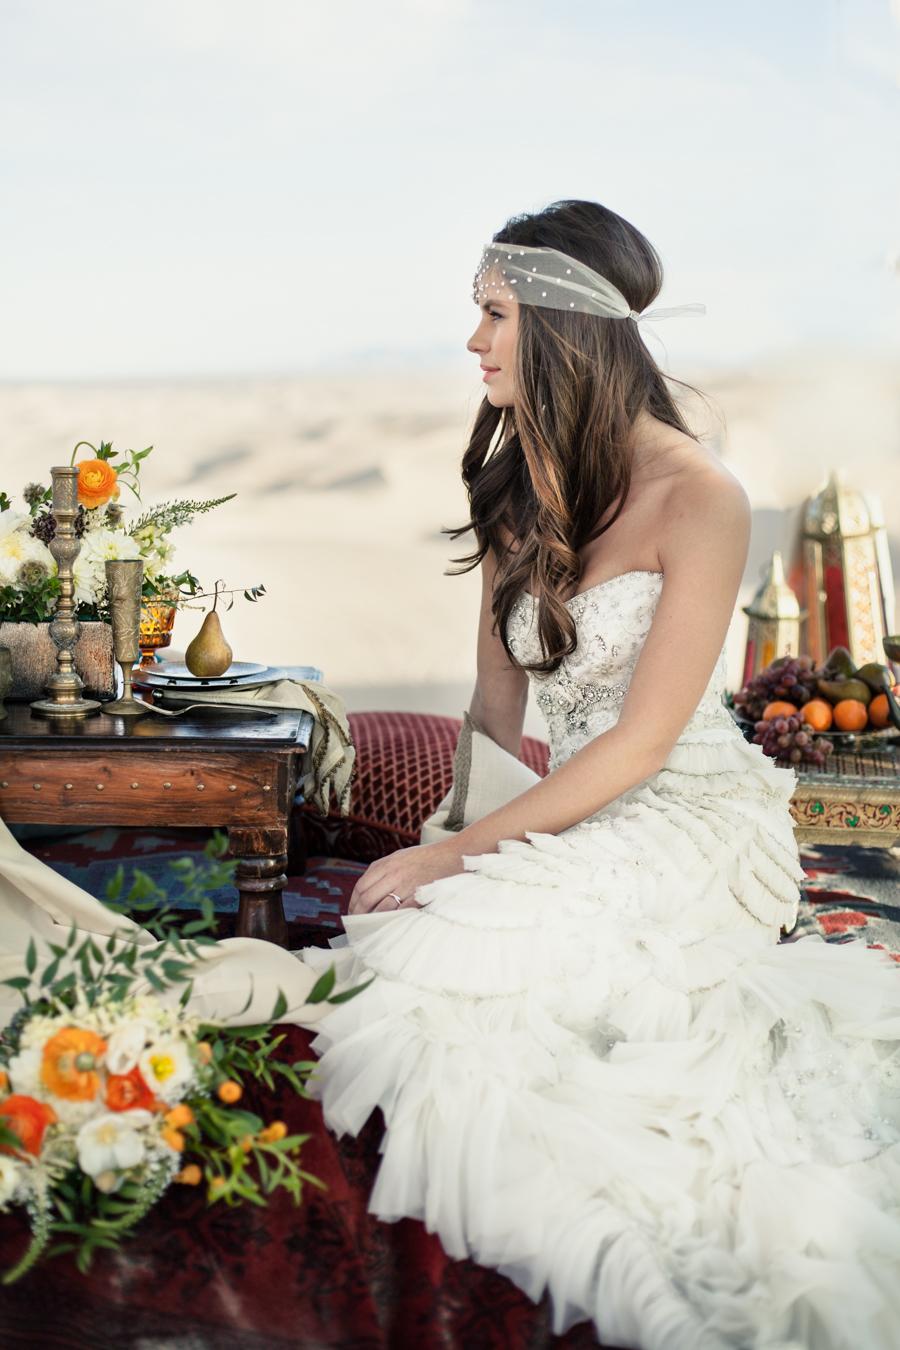 MK_Sadler_Moroccan-181_905.jpg